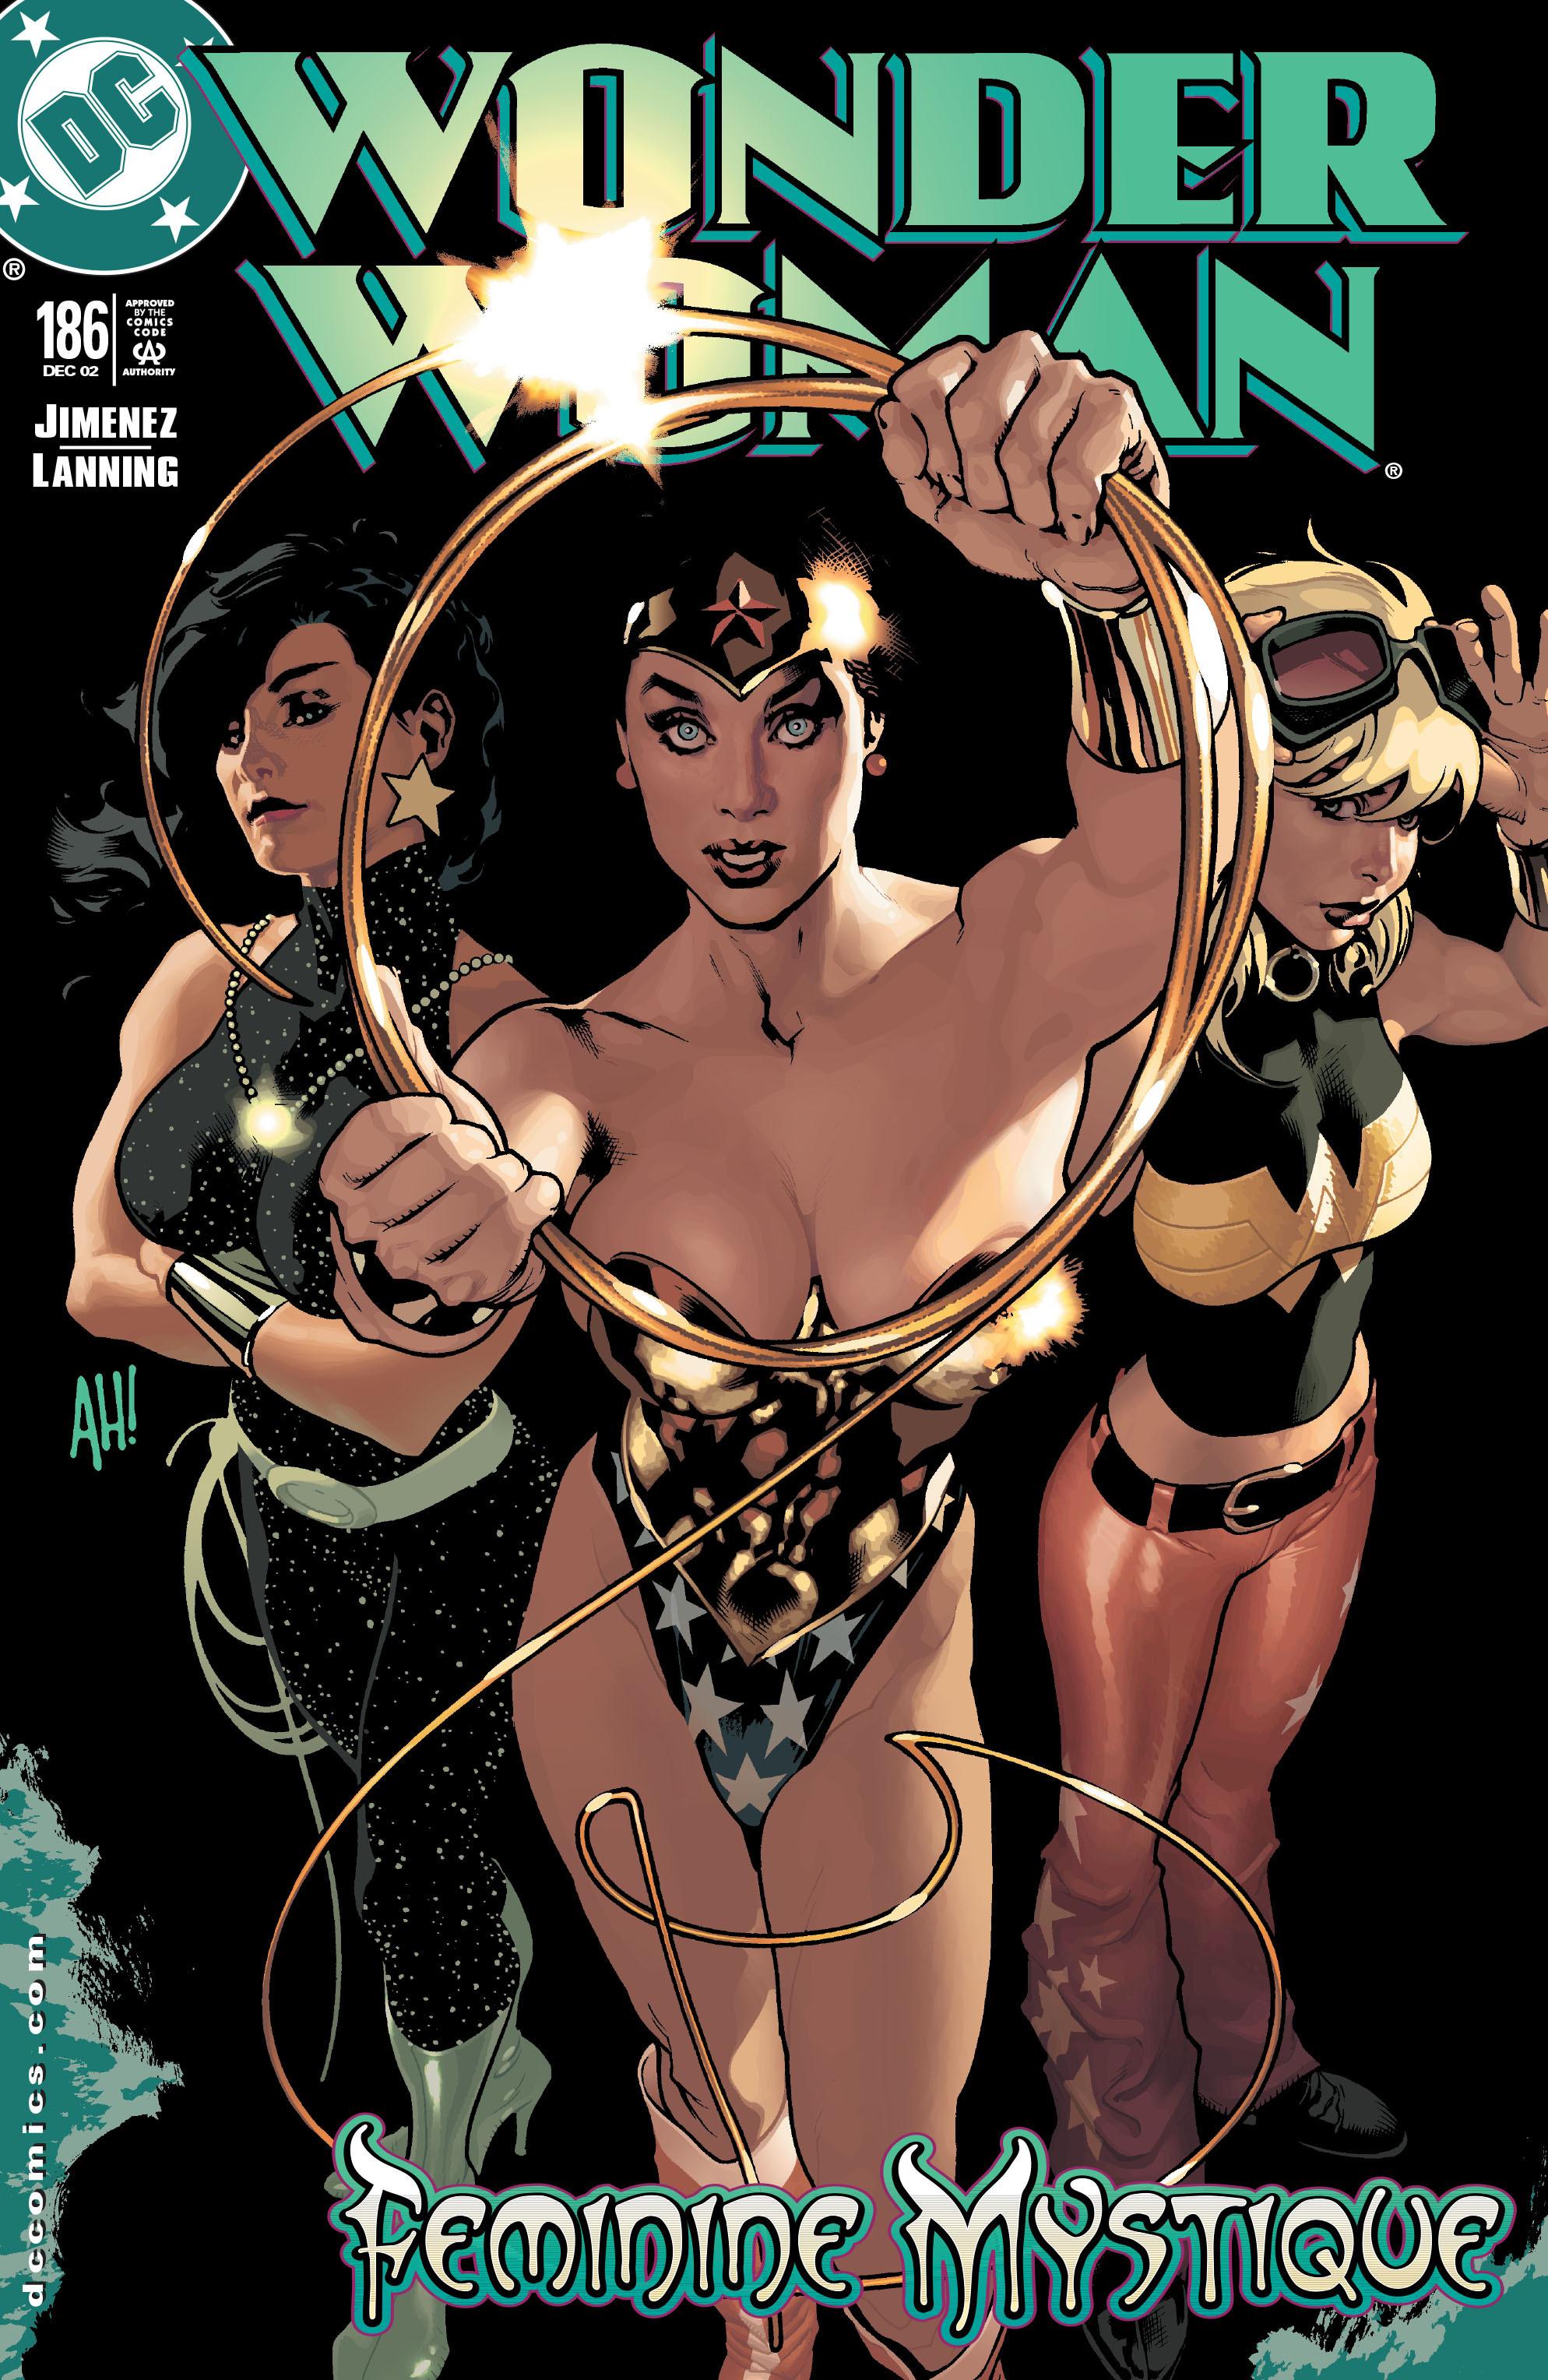 Read online Wonder Woman (1987) comic -  Issue #186 - 1